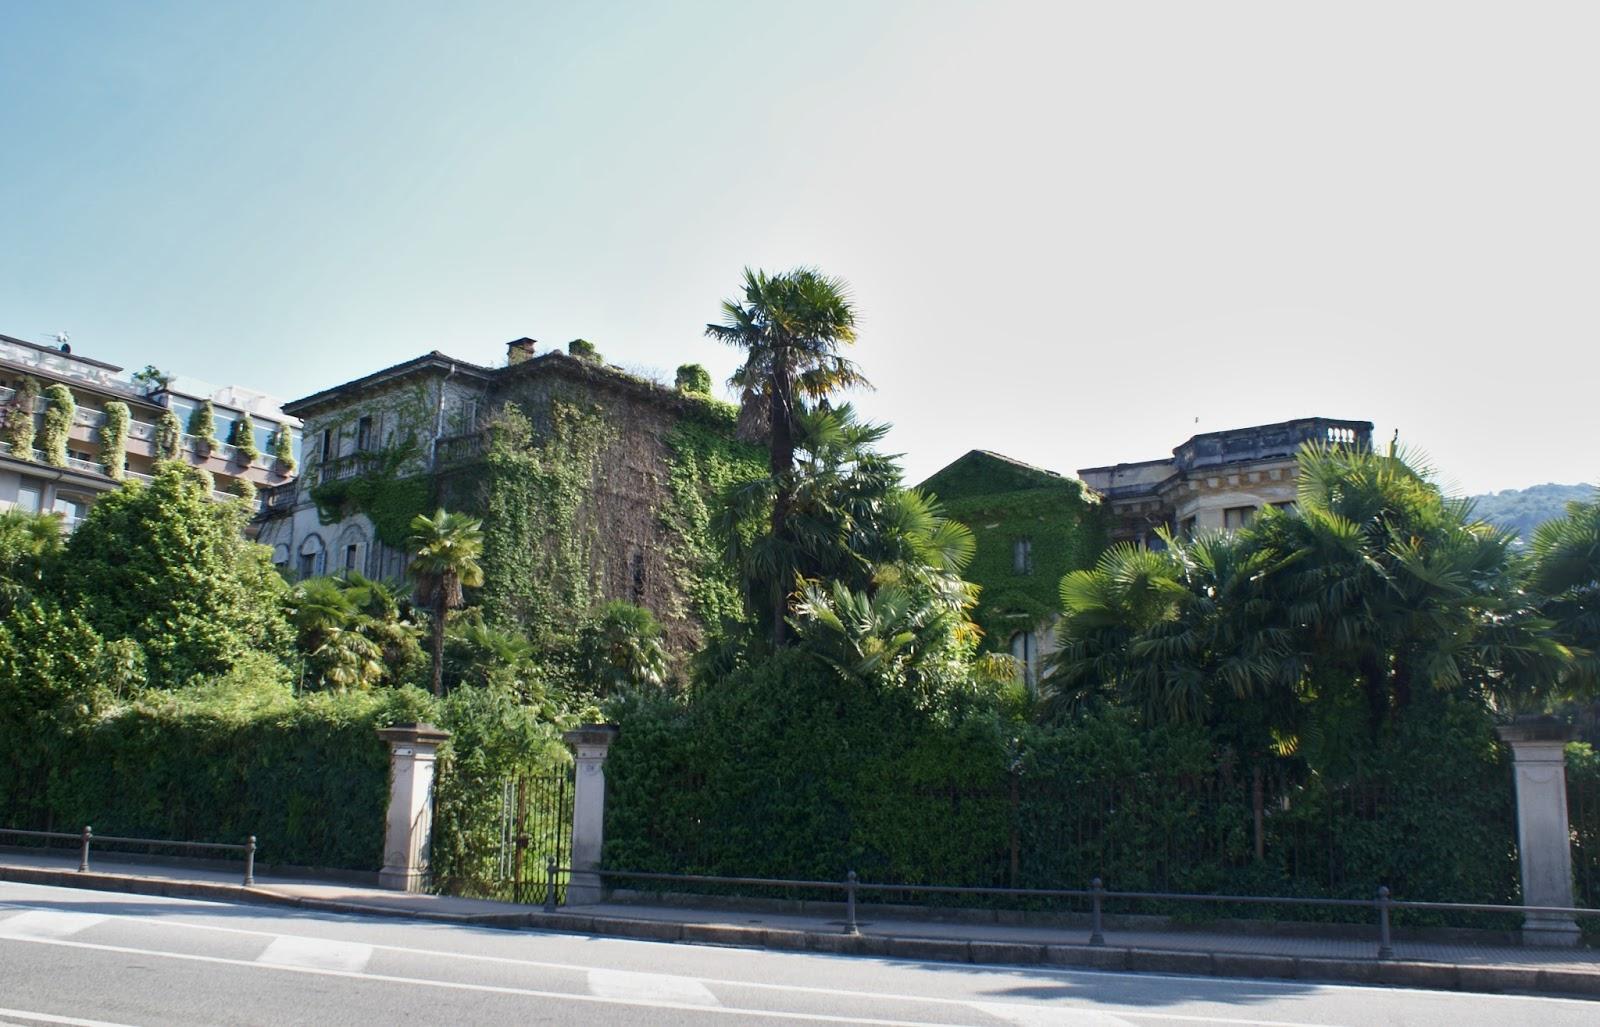 abandoned house urbex stresa italia italy piemonte lago maggiore